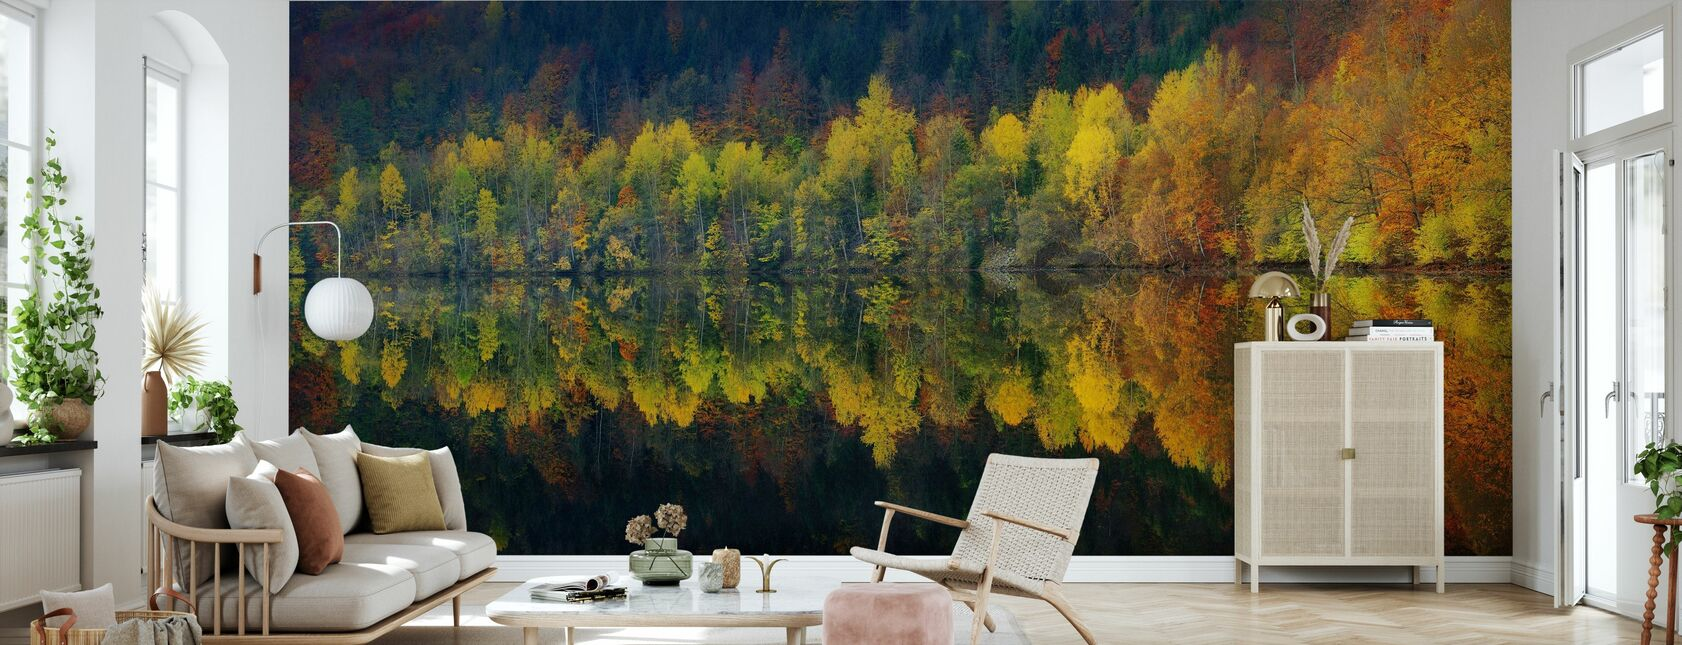 Autumnal Silence - Wallpaper - Living Room